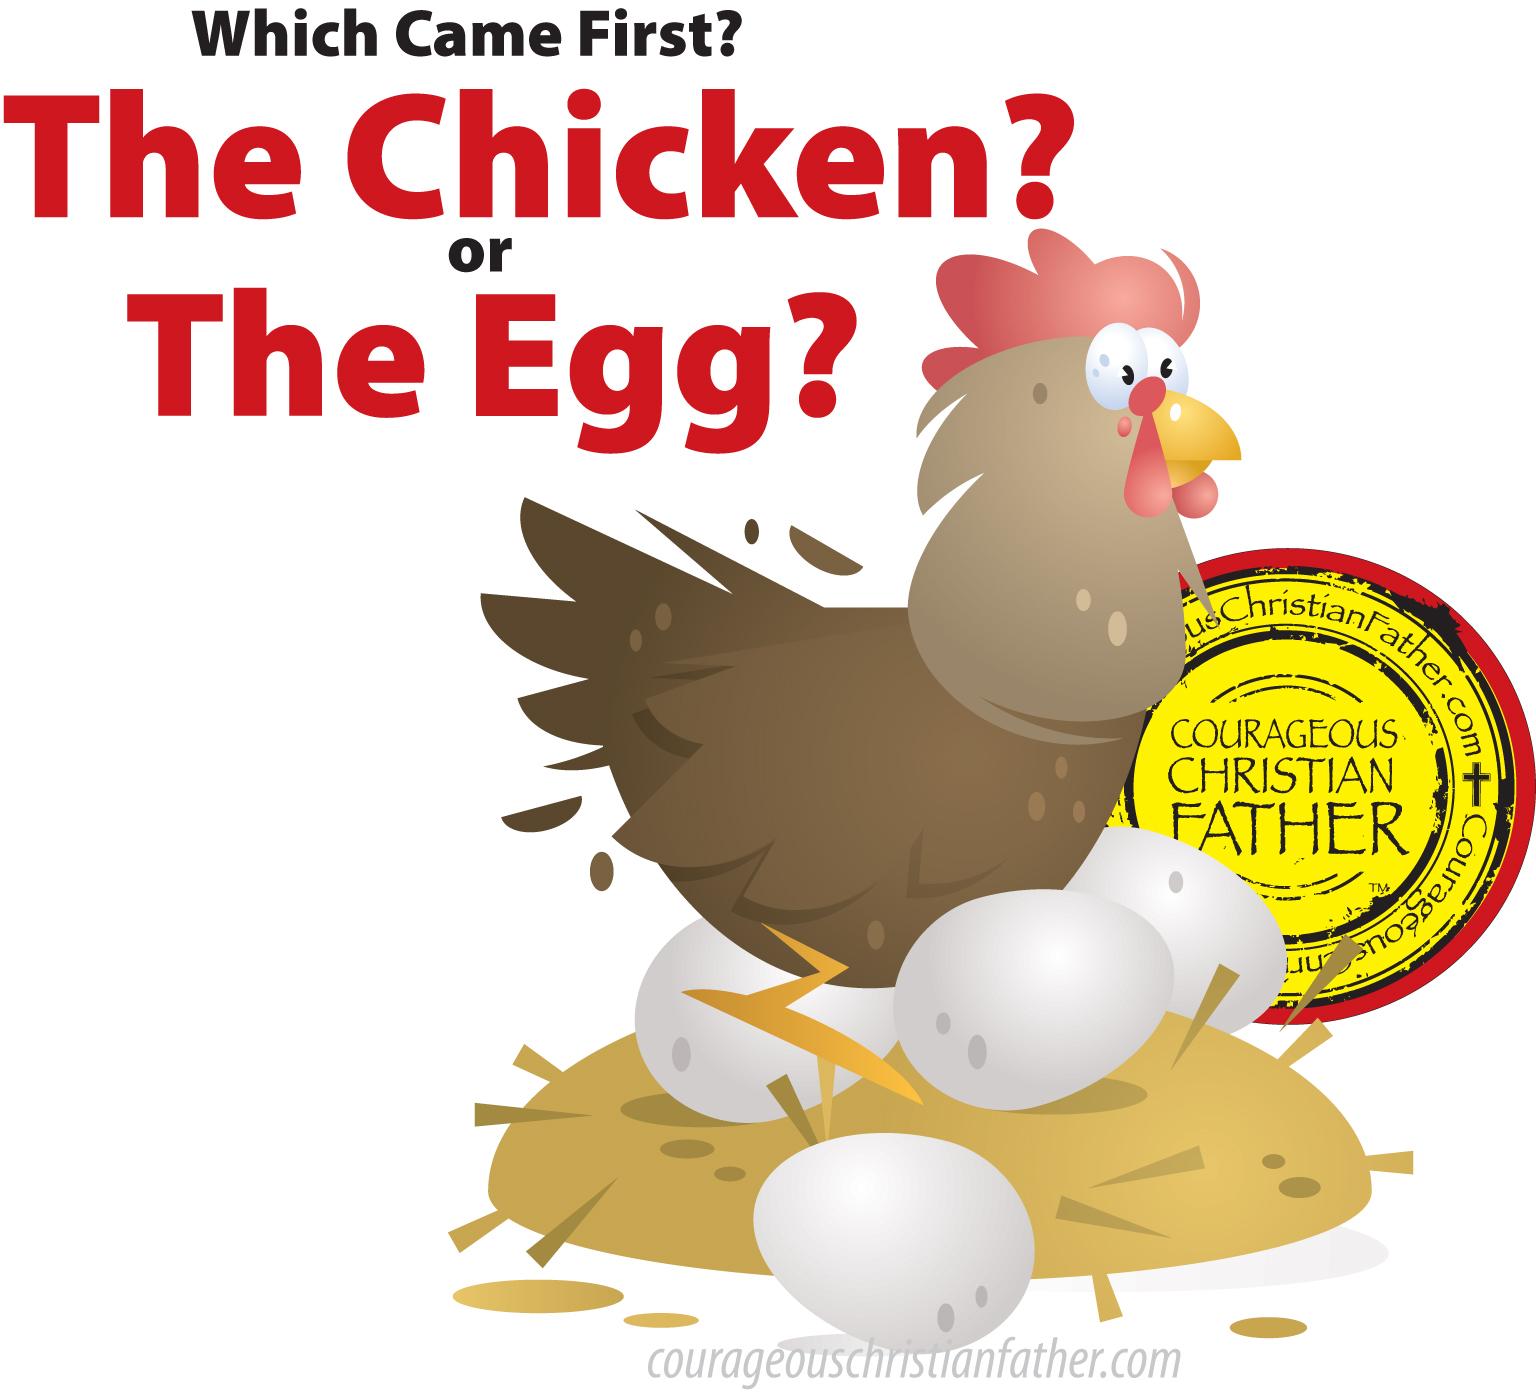 Chicken or Egg?